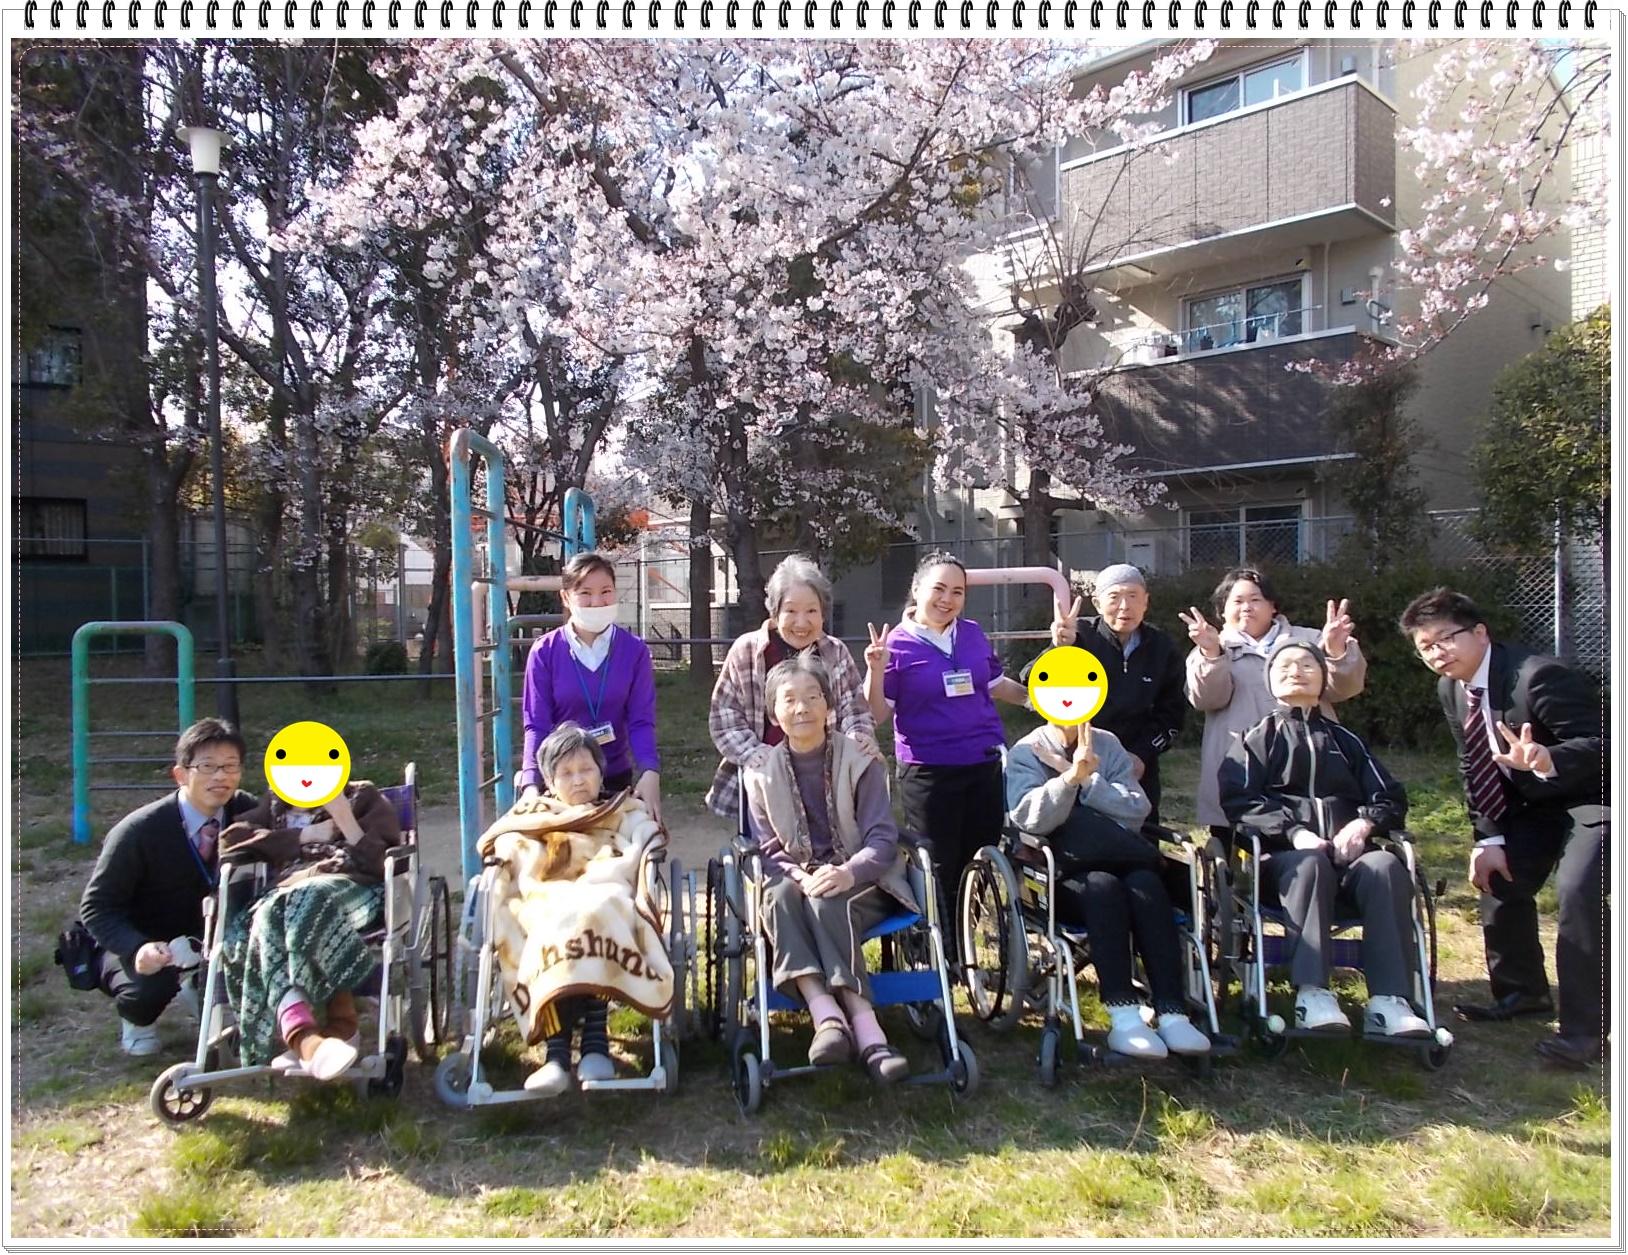 http://www.supercourt.jp/blog/hirano/4.4.JPG